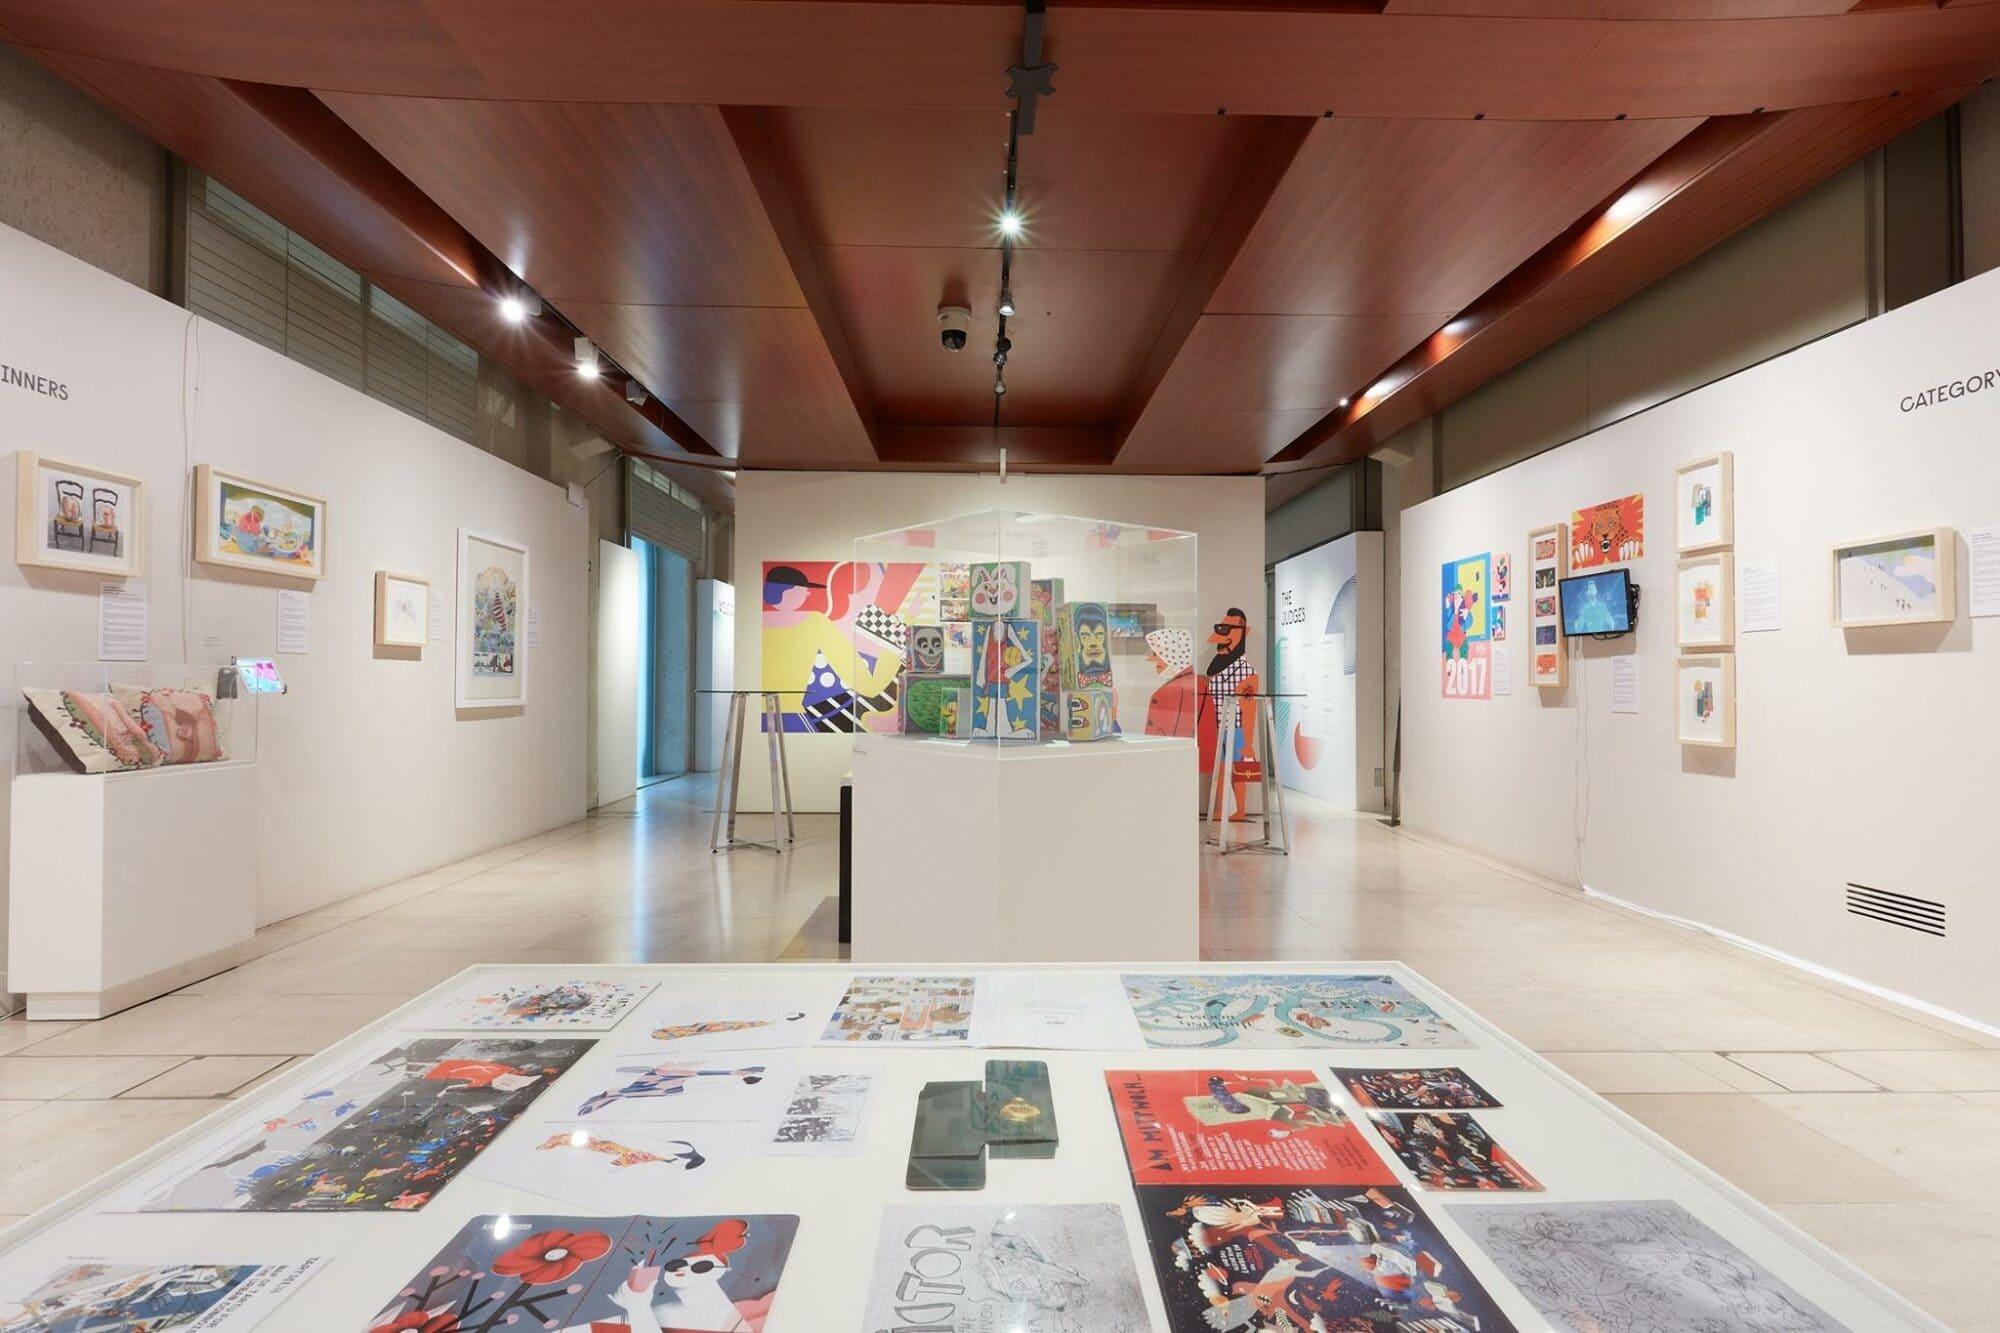 World Illustration Awards 2018 Exhibition, The Association of Illustrators, Somerset House, London.